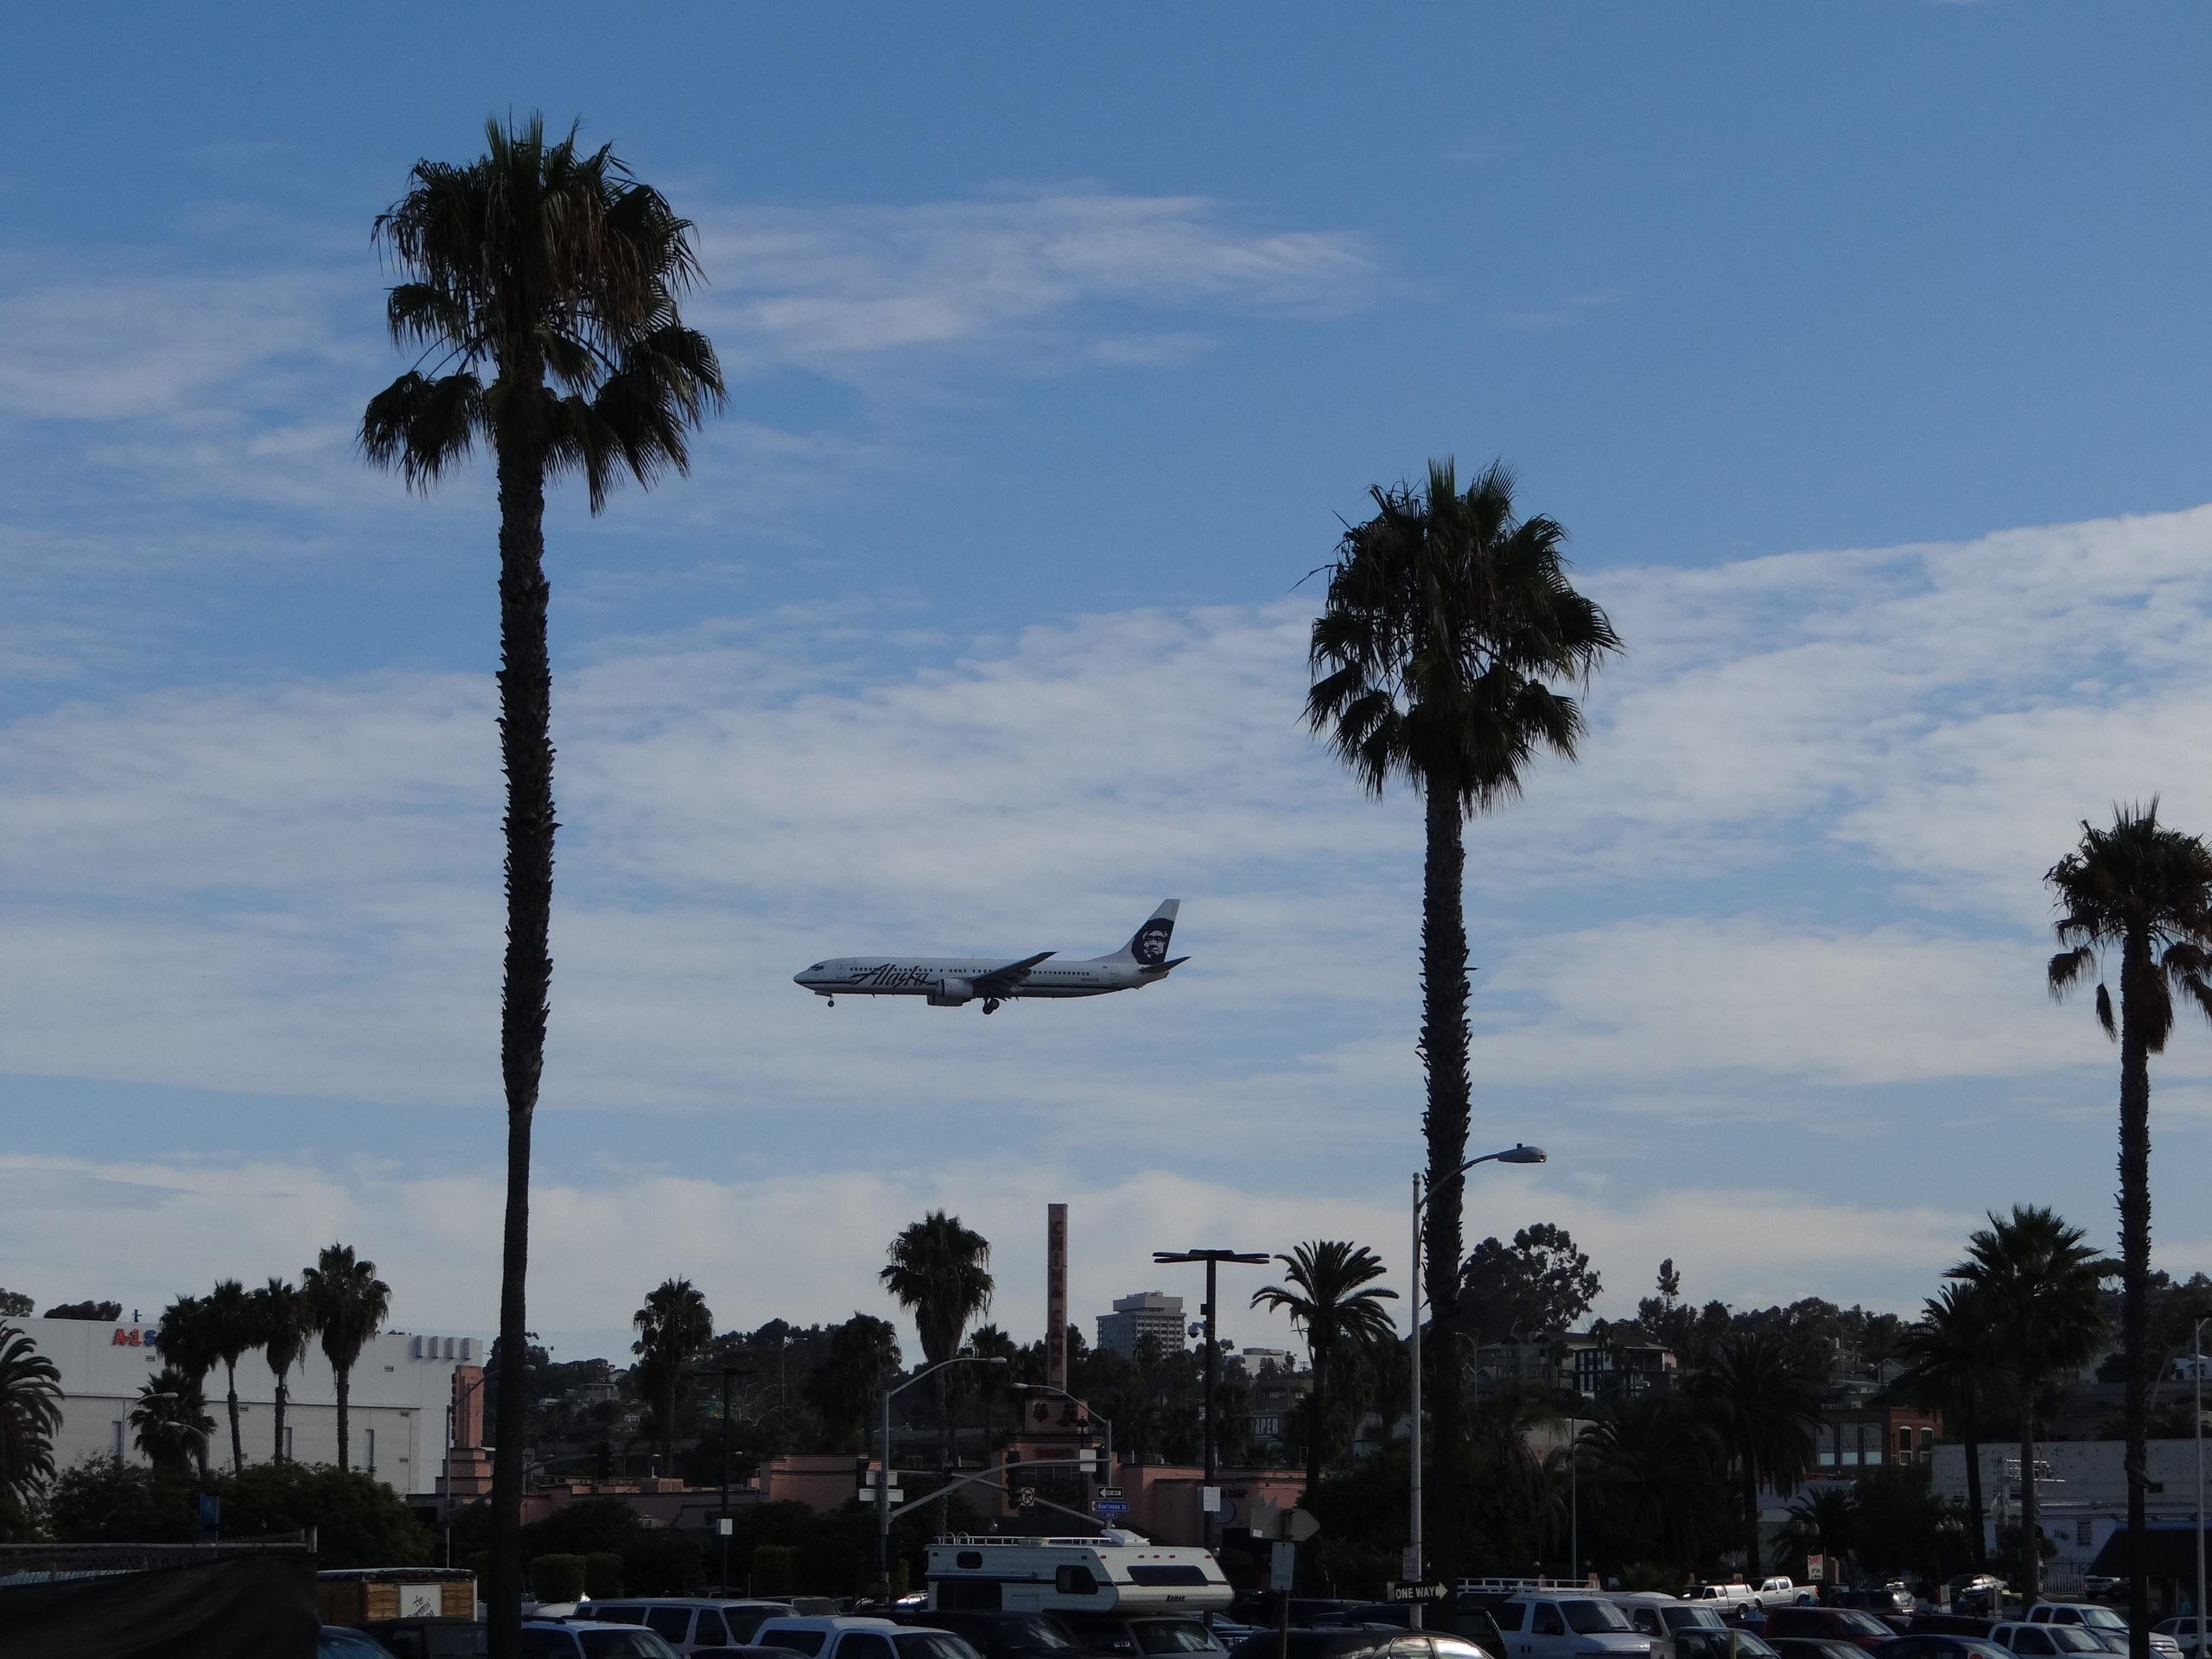 Plane landing in San Diego Helen in Wonderlust